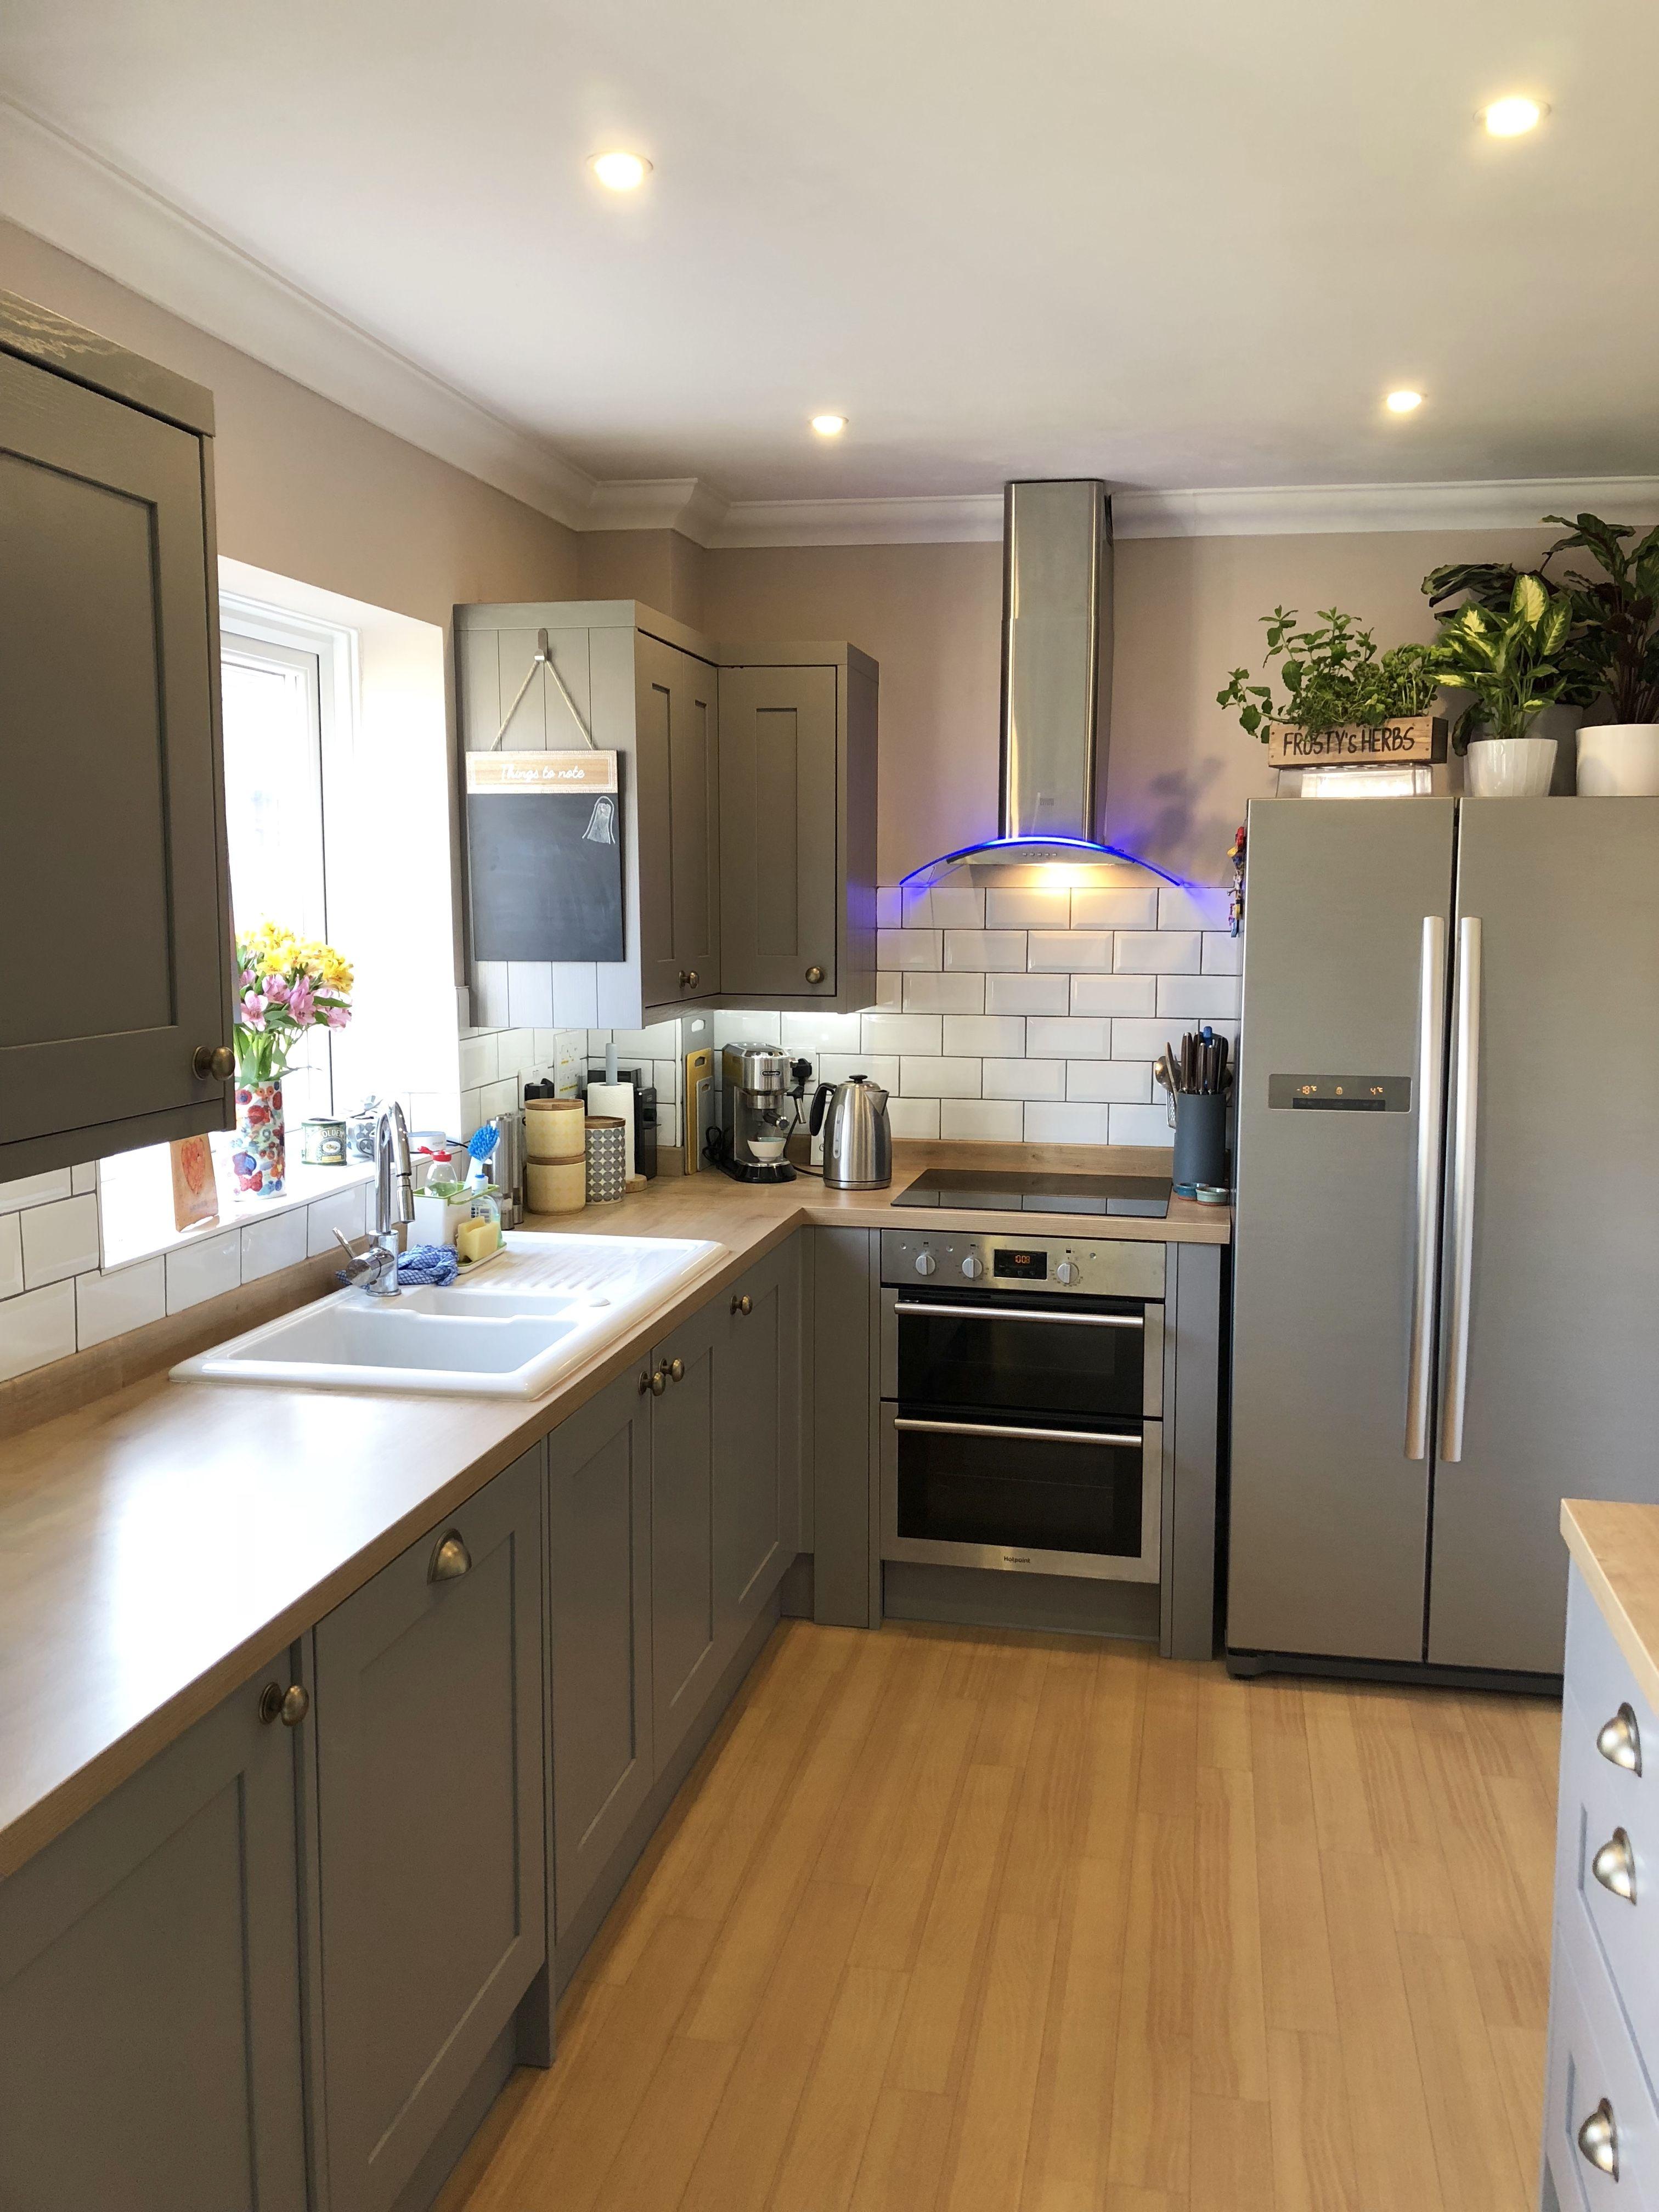 B Q Carisbrook Taupe Kitchen Wicks Windsor Handles And Subway Tiles Taupe Kitchen Kitchen Design B Q Kitchens